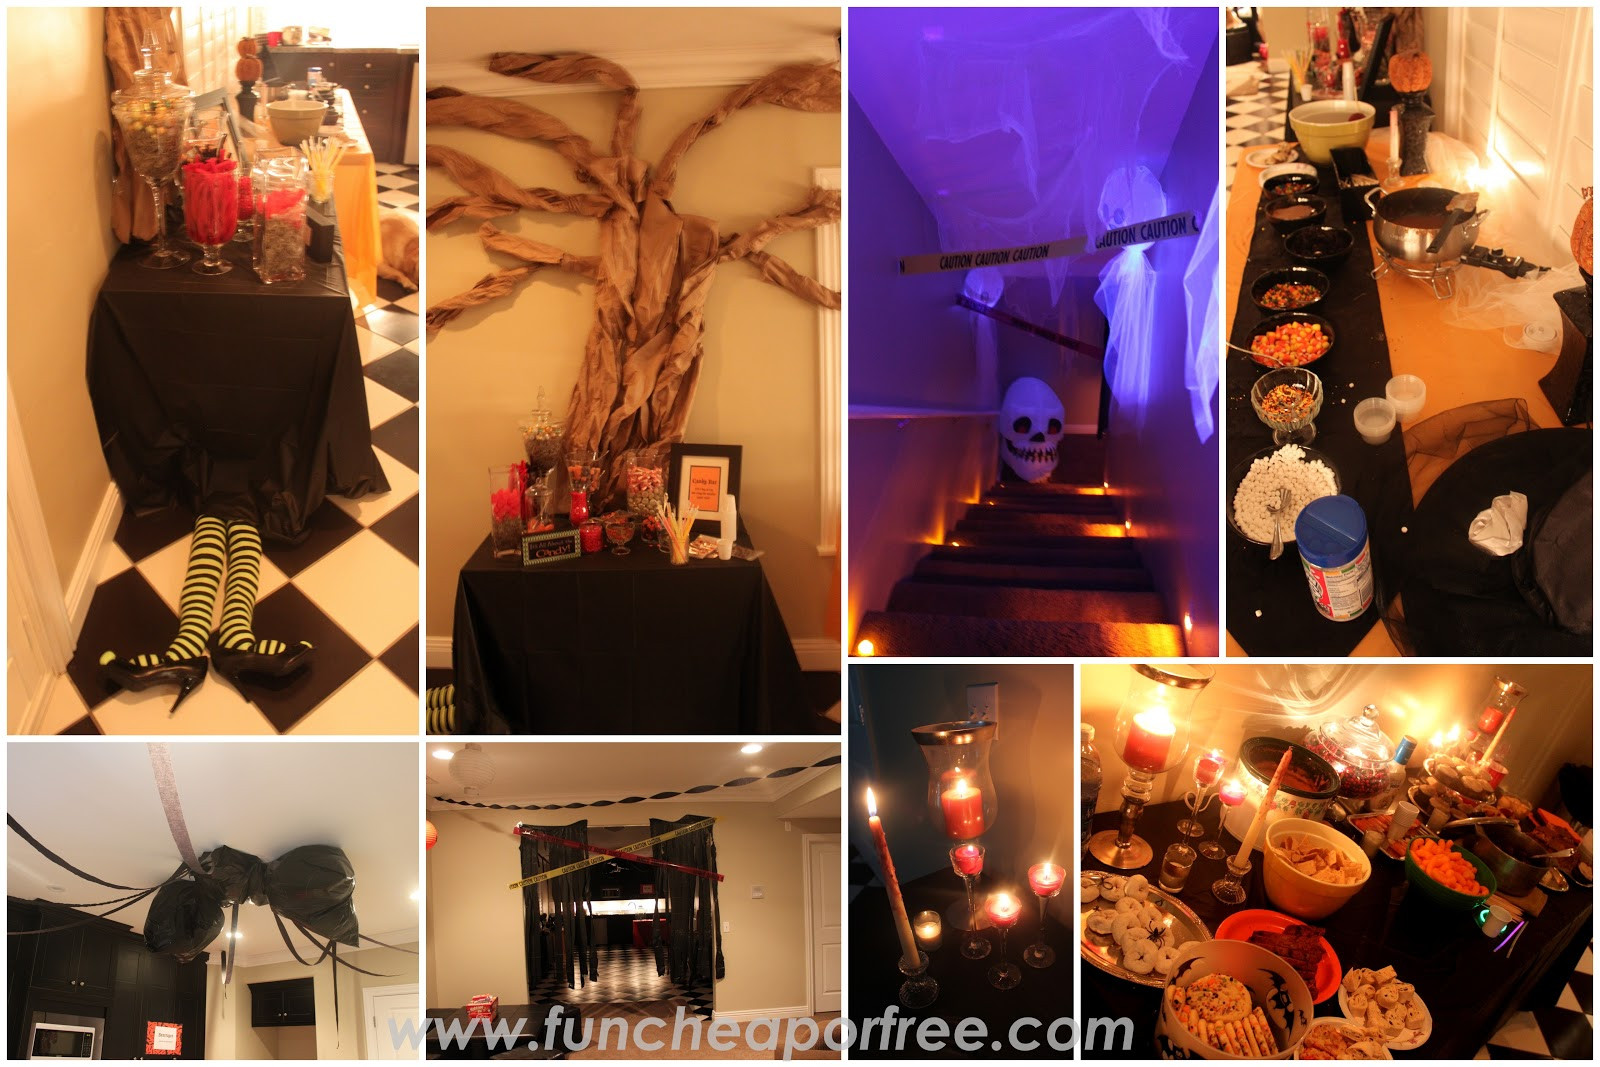 Funny Halloween Party Ideas  Halloween Party Ideas fun cheap or free style Fun